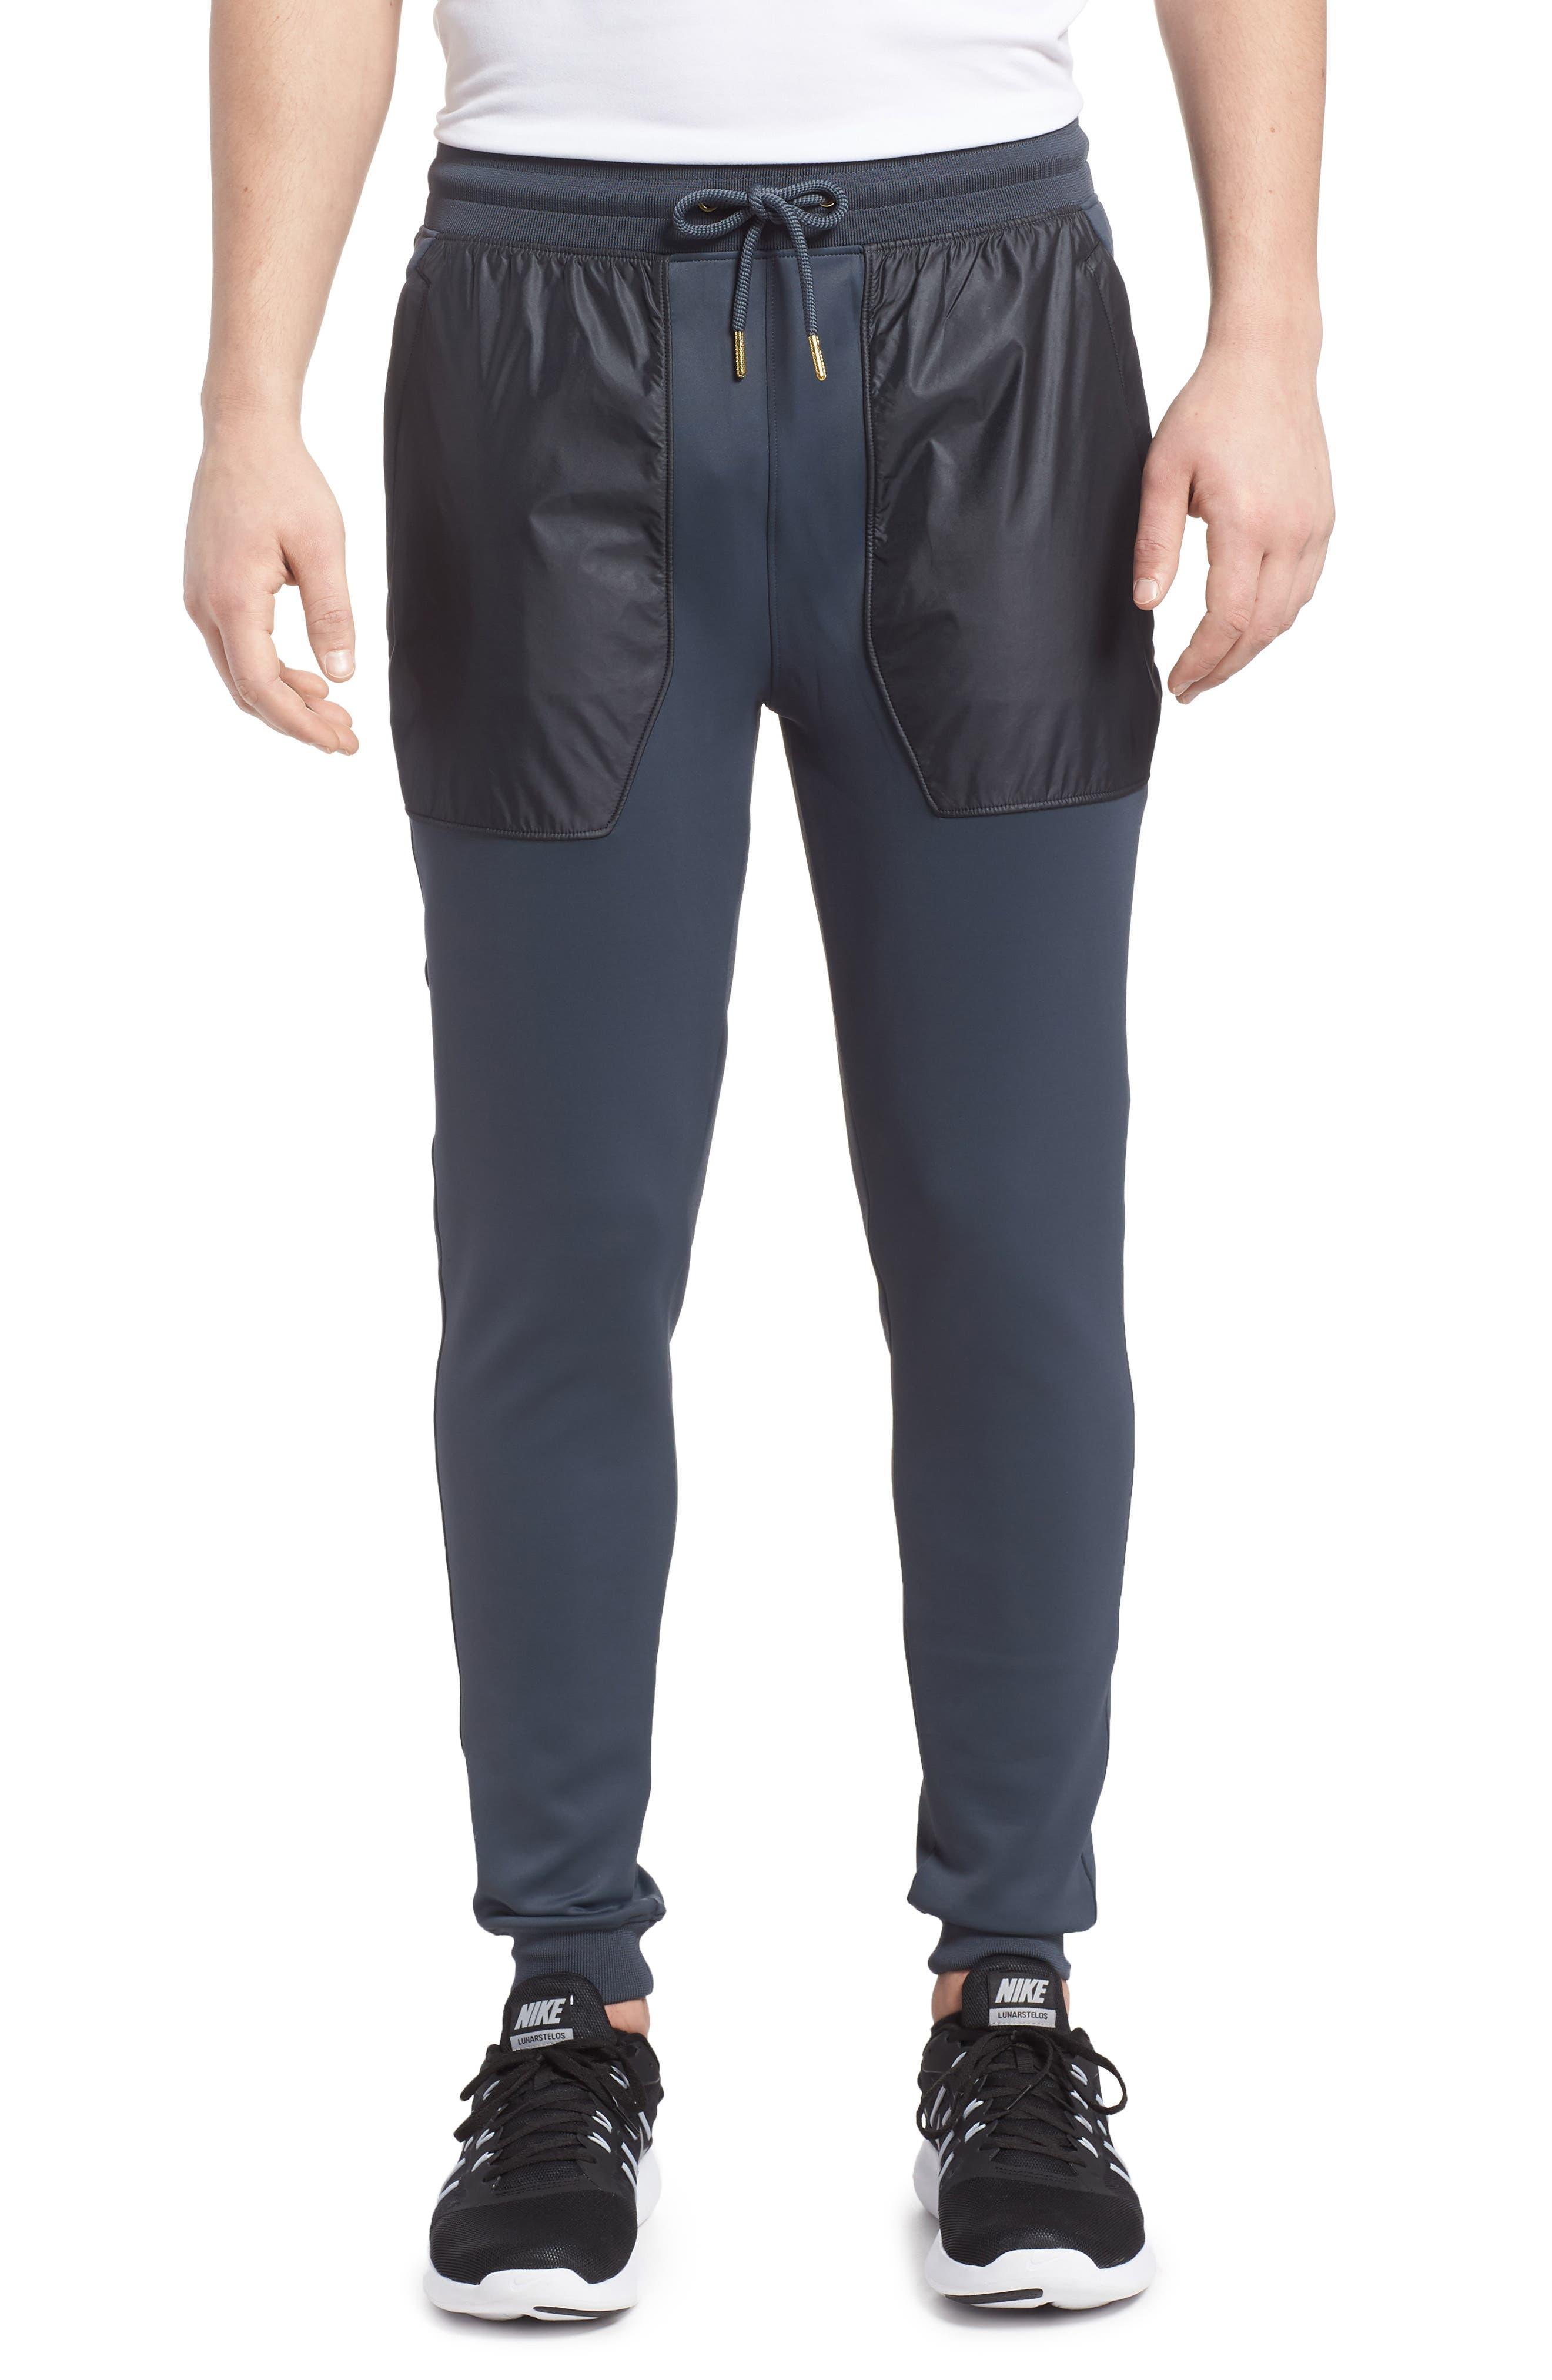 Utility Jogger Pants,                         Main,                         color, Stealth Gray/ Black